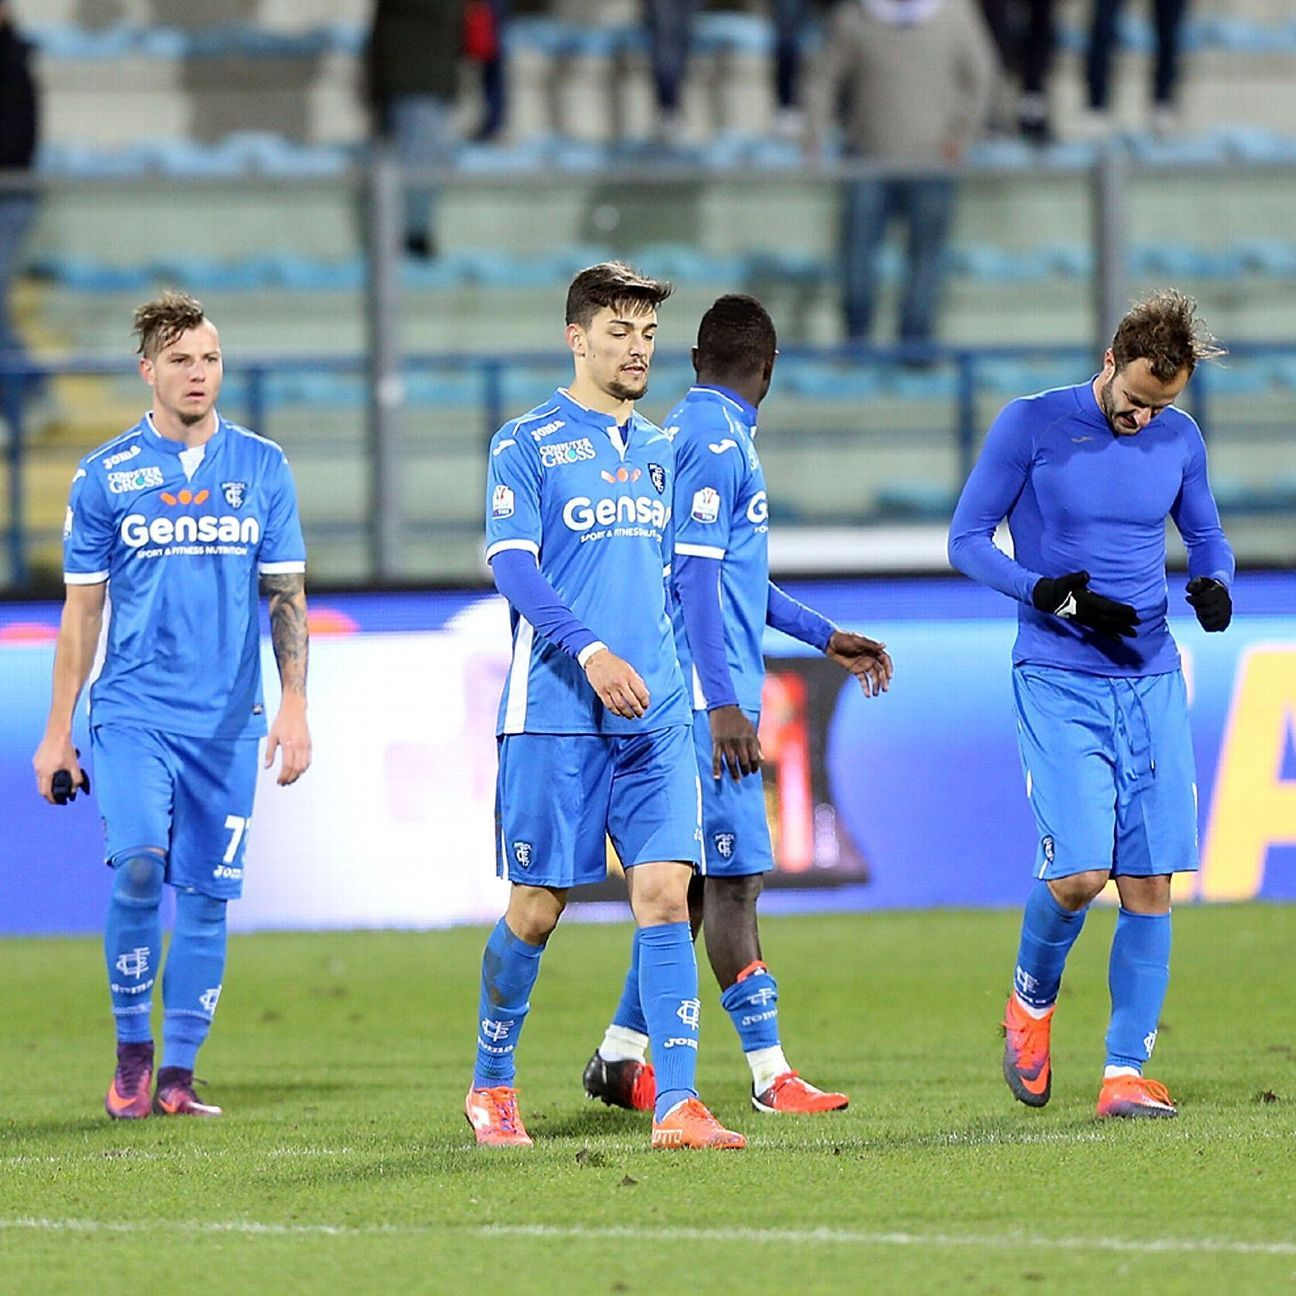 Coppa Italia: Cesena knock out Empoli while Torino and ...